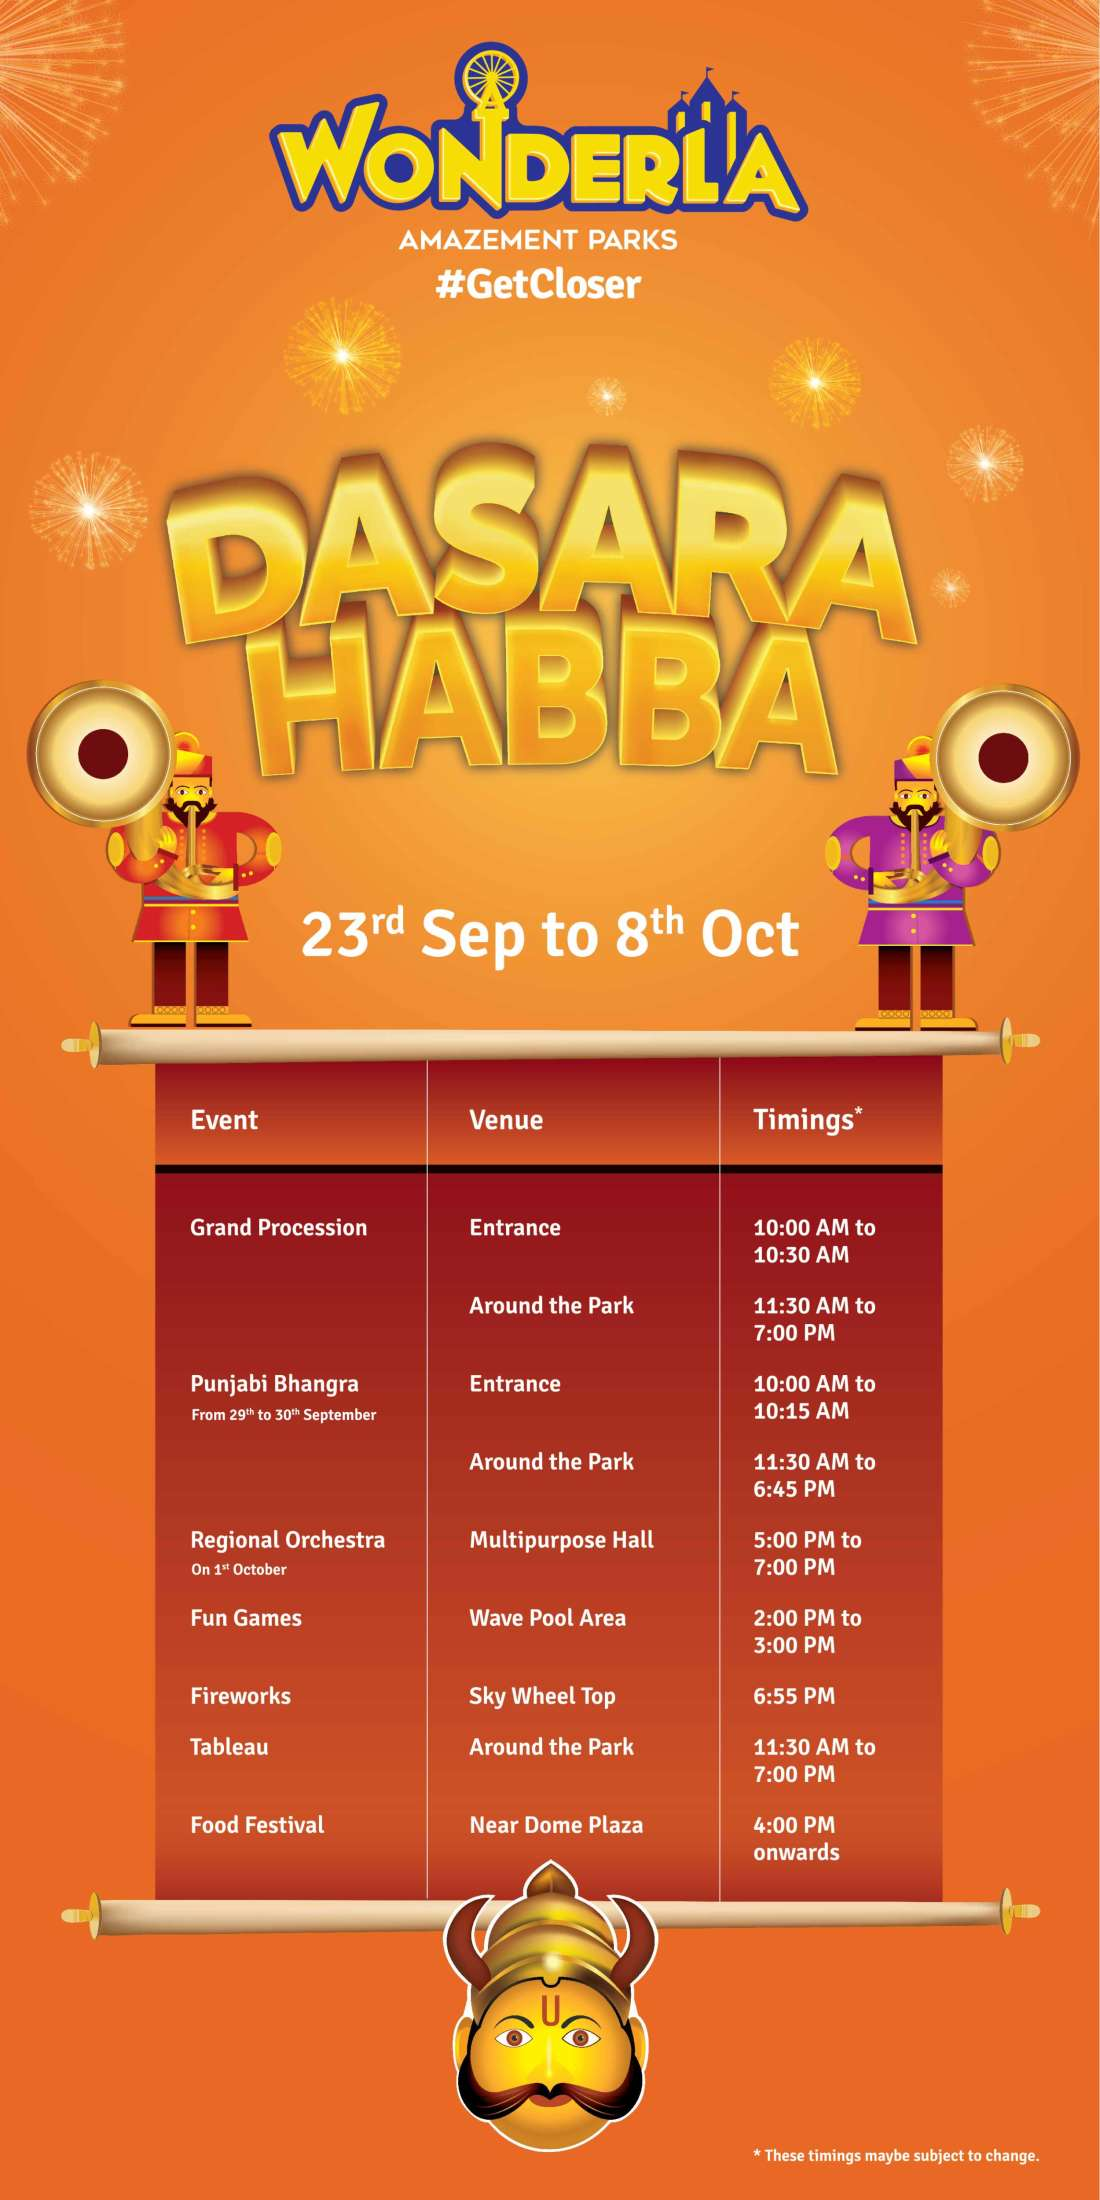 Wonderla Amusement Parks & Resort  Standee Programme Detailes Standee Bangalore W 3 x H 6 ft 22 9 17 Final-01